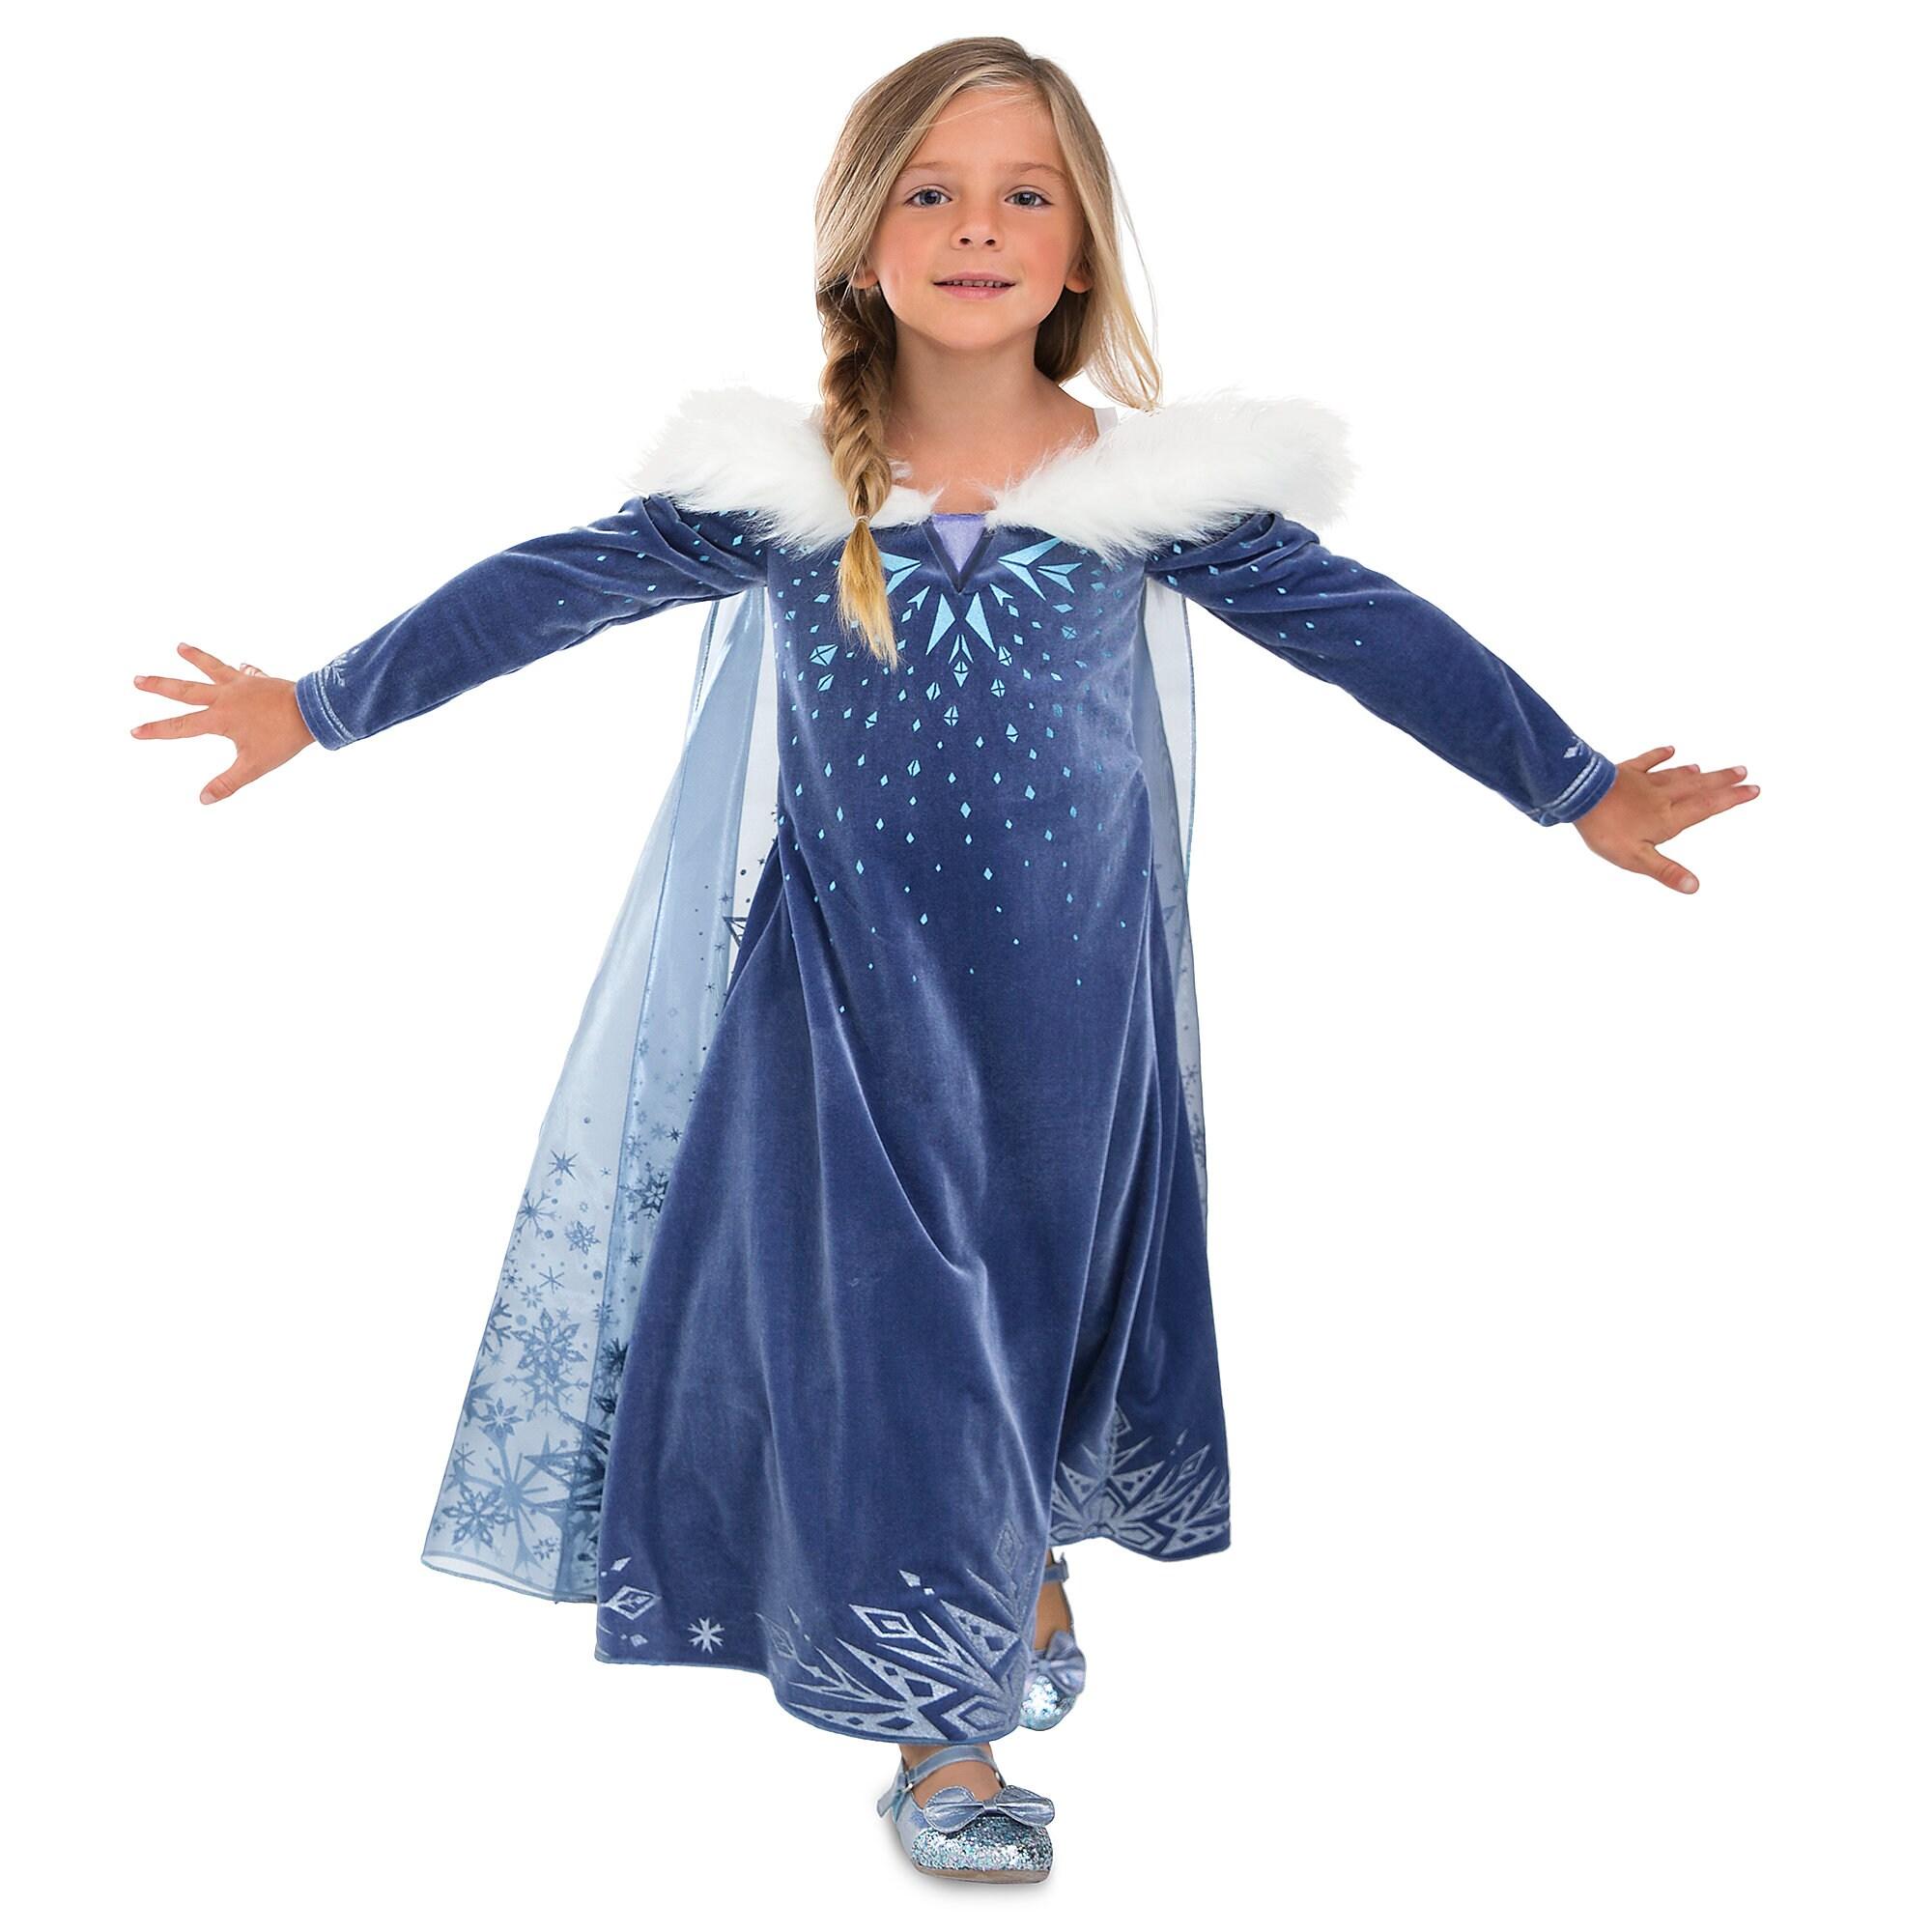 Delightful Product Image Of Elsa Deluxe Costume For Kids   Olafu0027s Frozen Adventure # 1